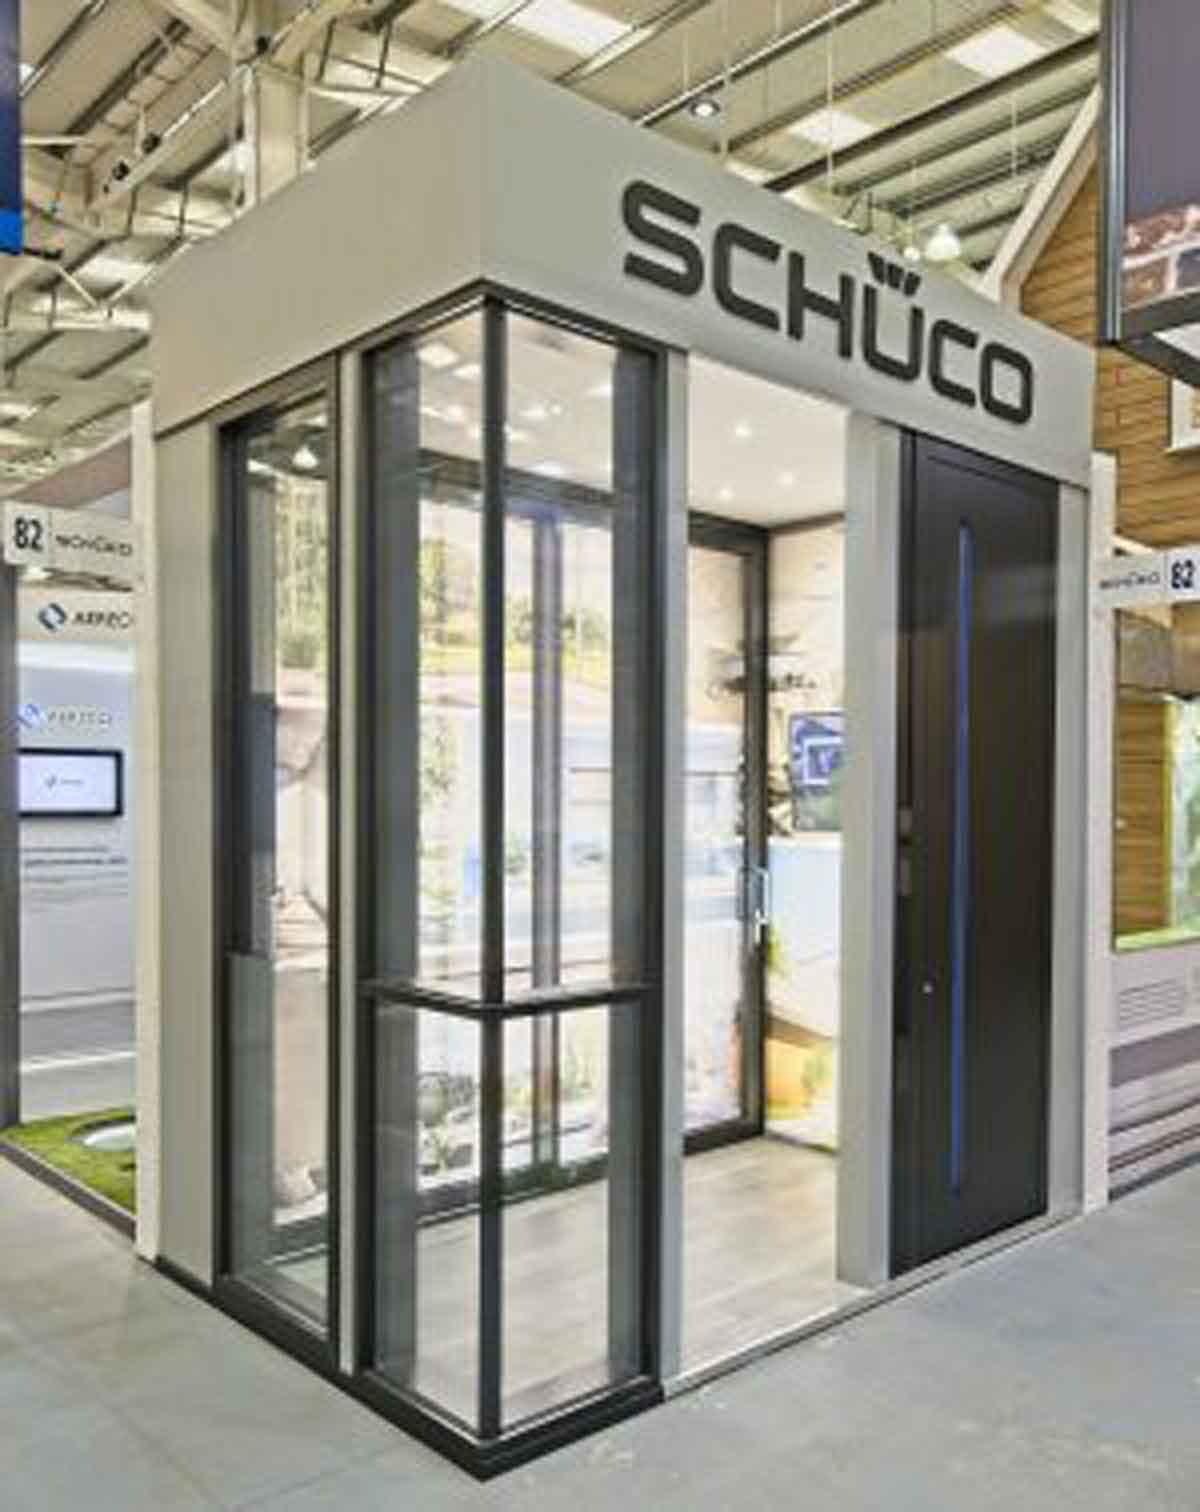 Shueco Uk Exhibition Cs Glaziers Group Glass